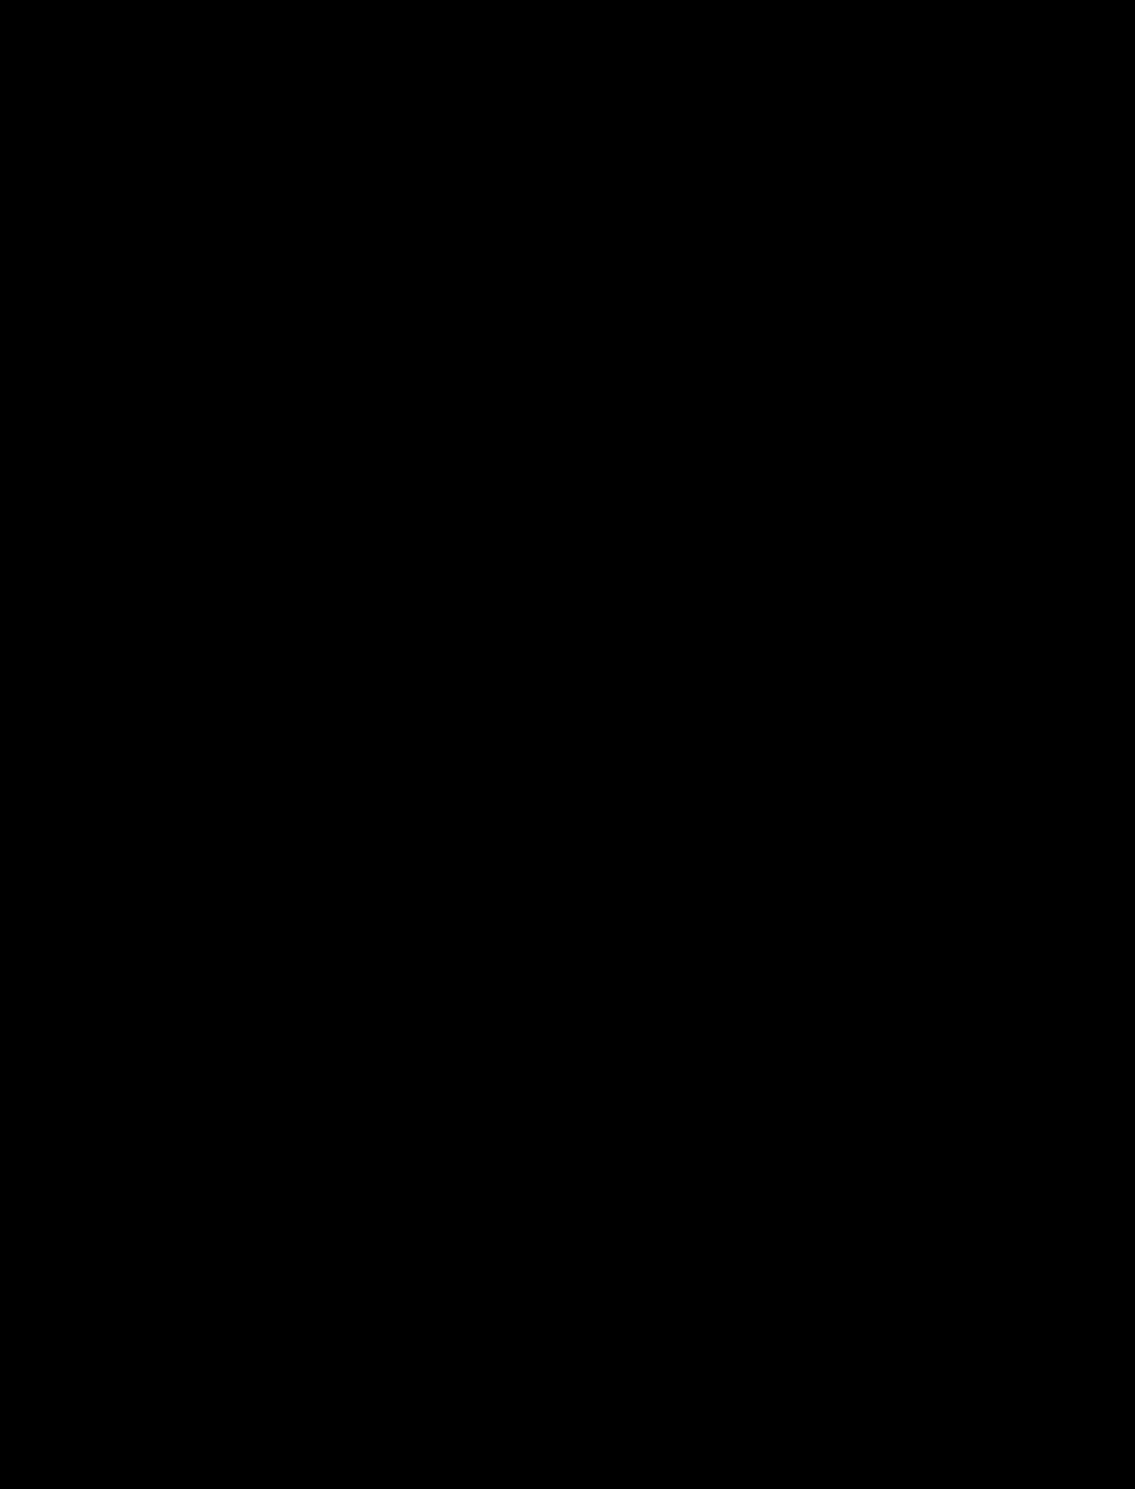 1135x1489 Clipart